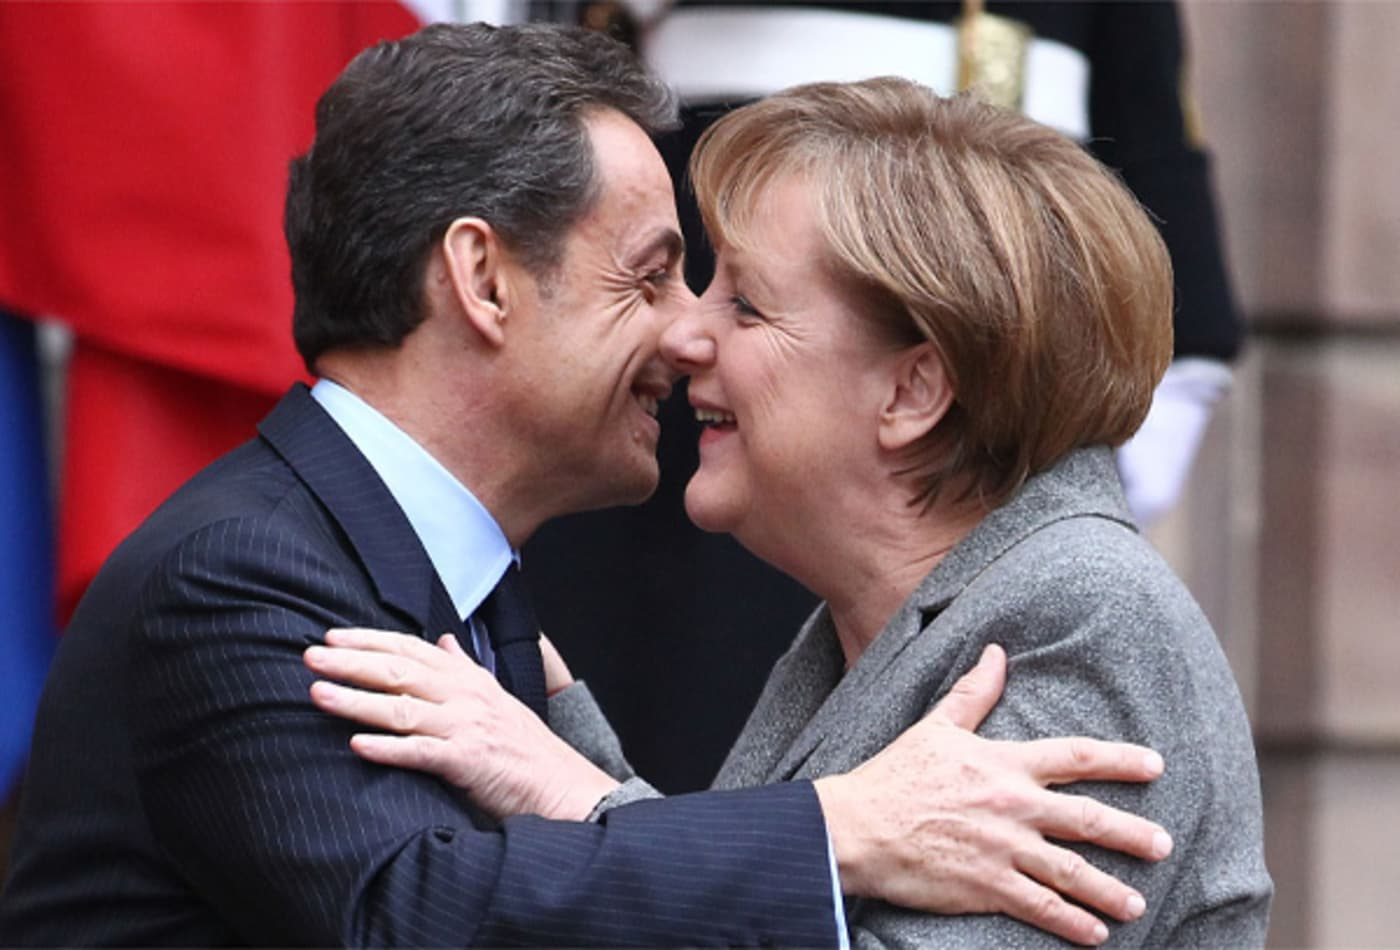 CNBC_Major_Events_Eurozone_Merkozy.jpg